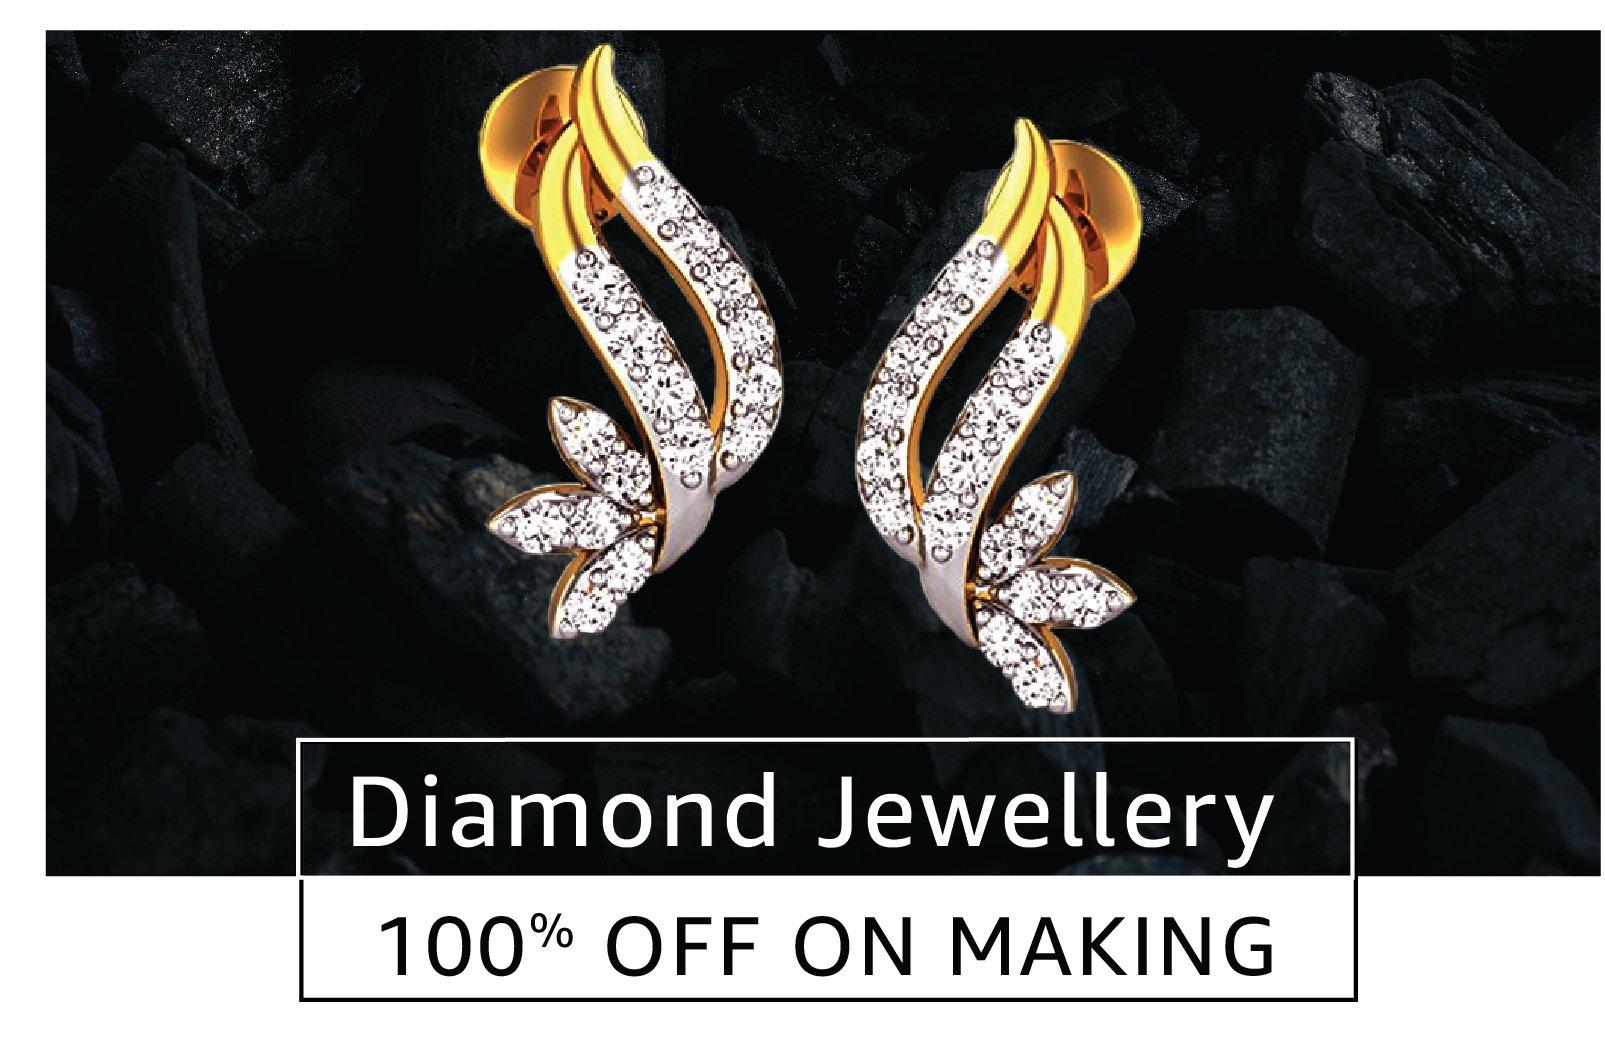 Diamond Jewellery 100% off on making